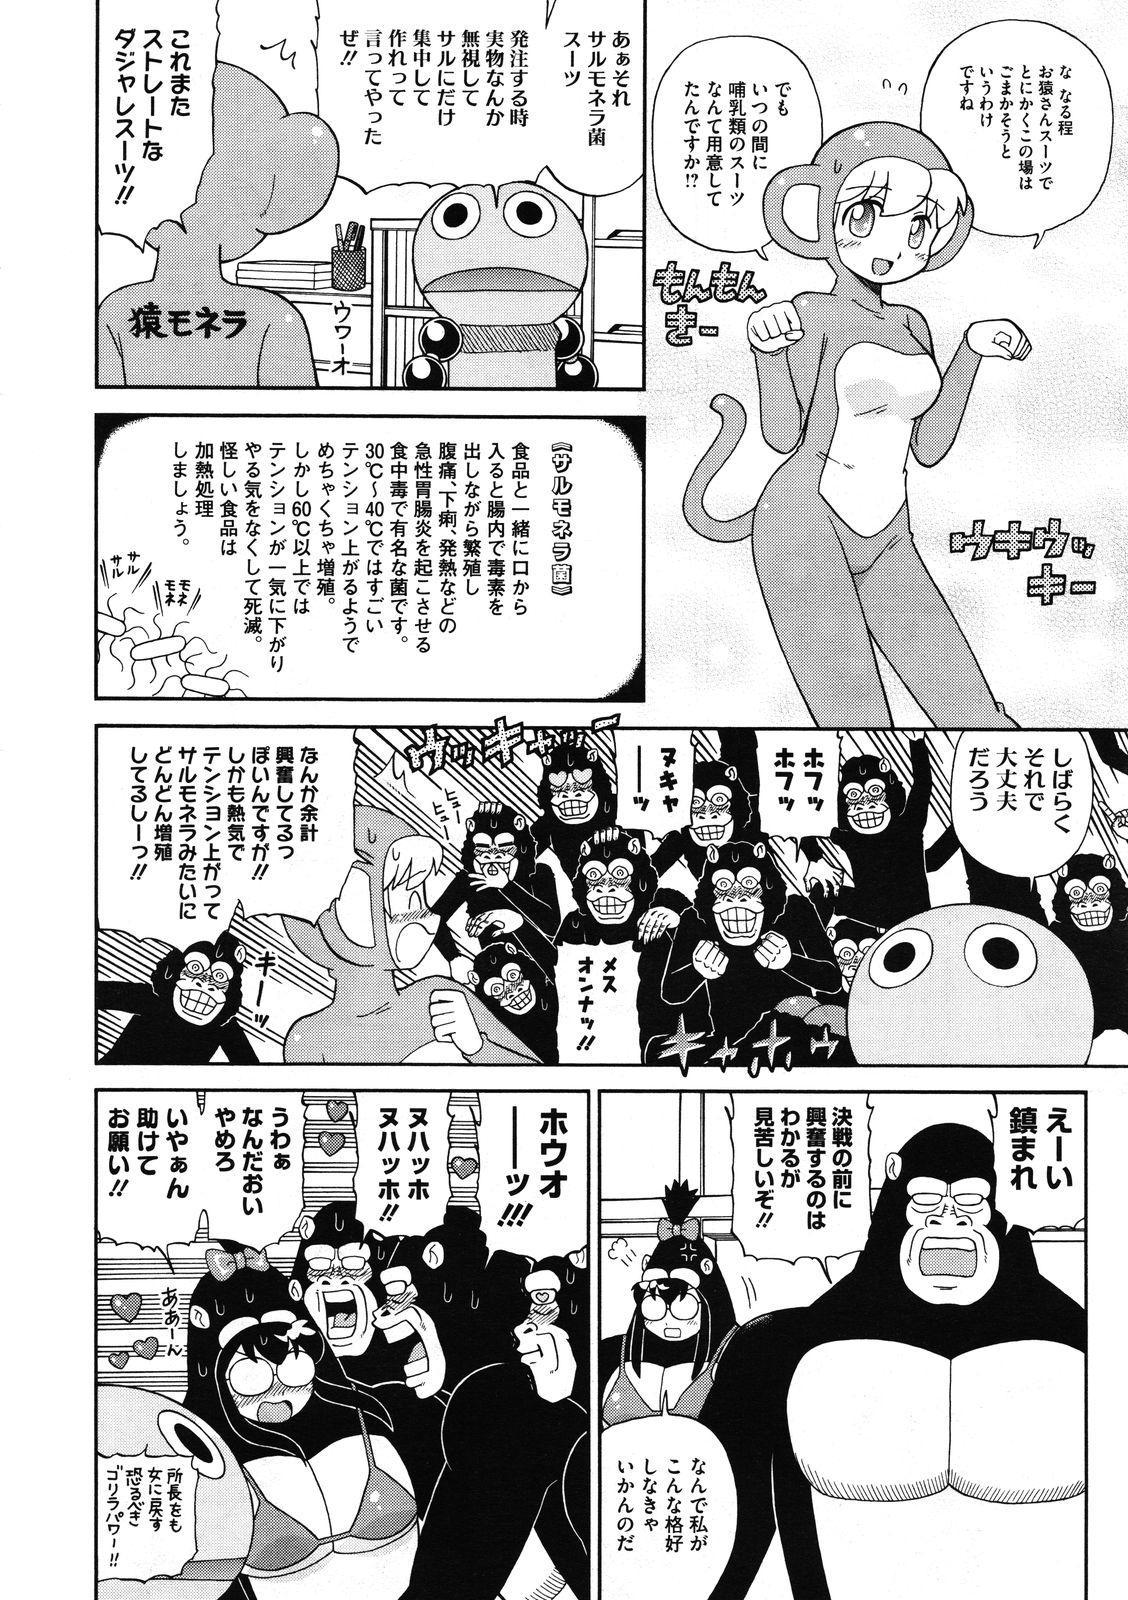 COMIC Megastore 2012-01 499